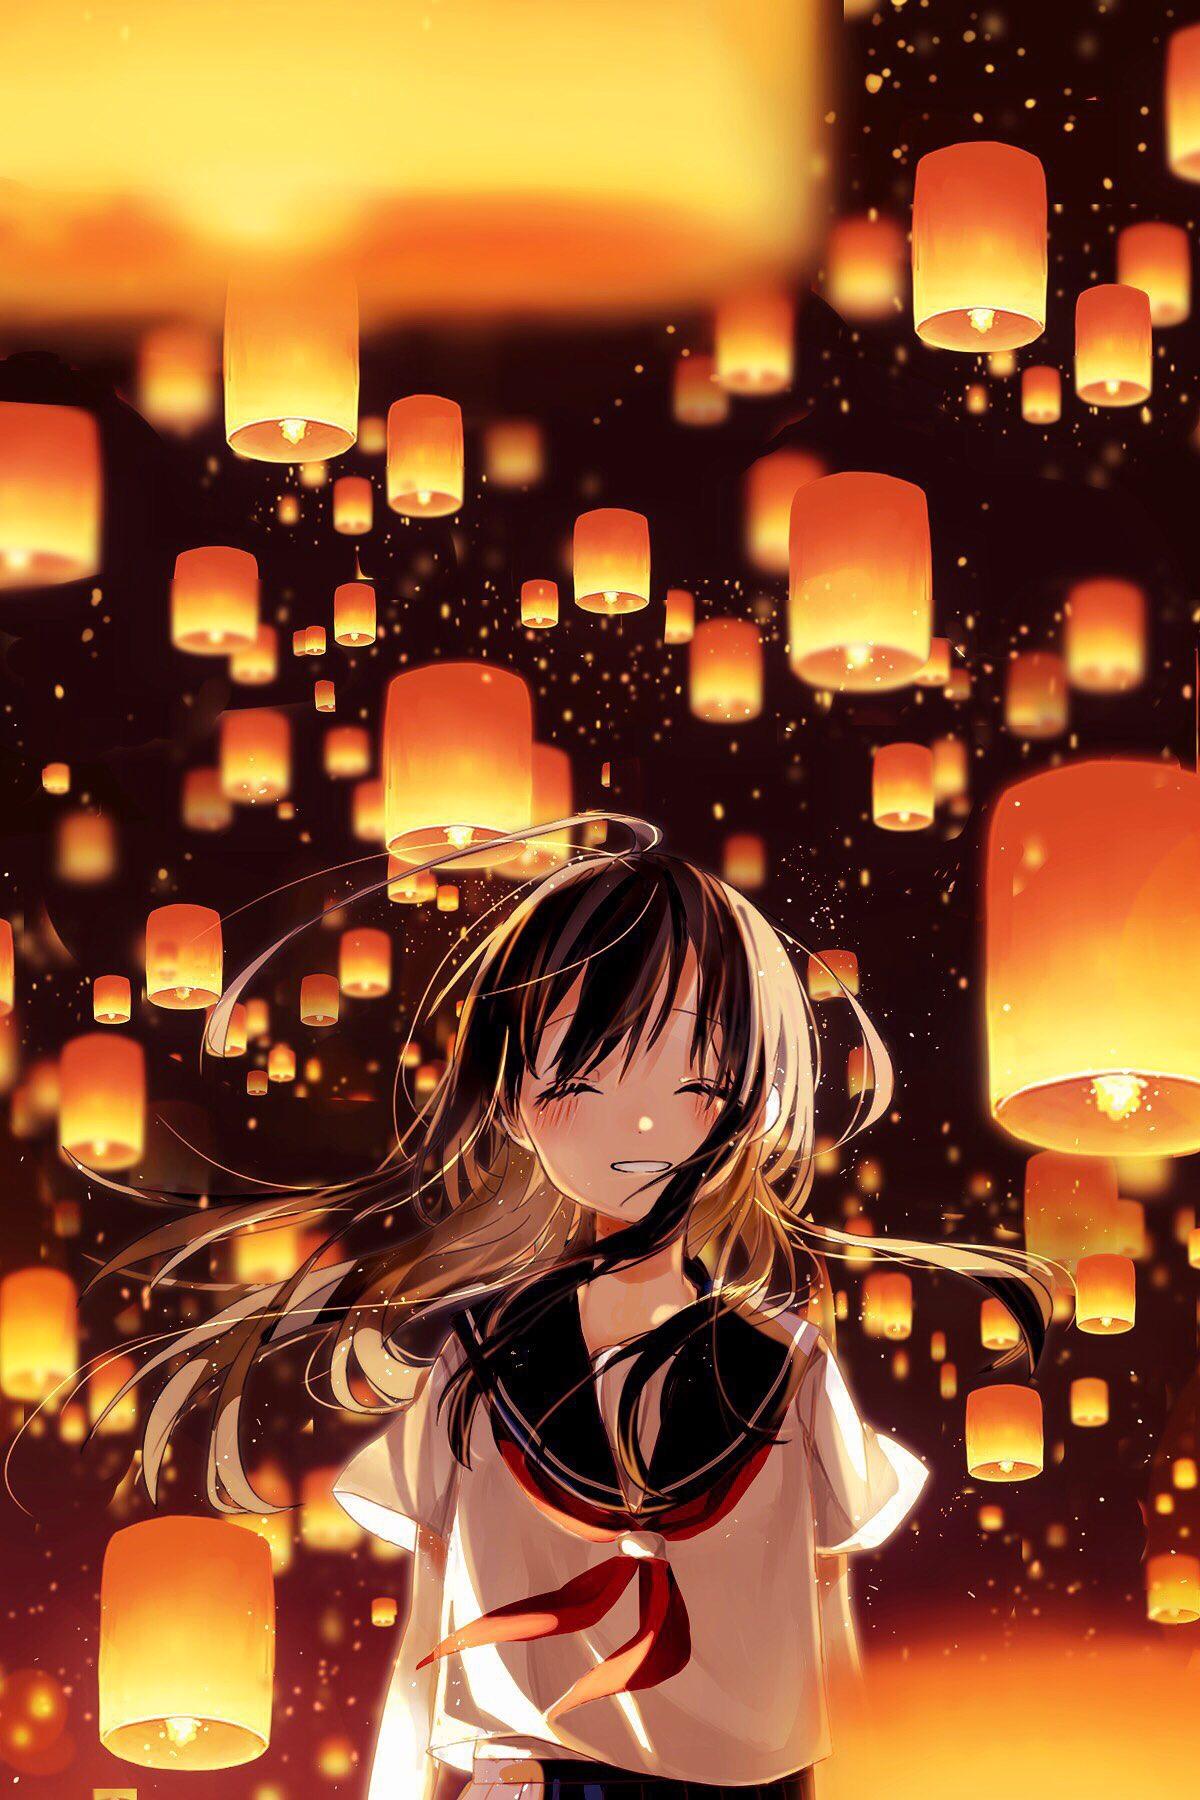 Anime 1200x1800 anime sailor uniform lantern smiling blushing lights night wind